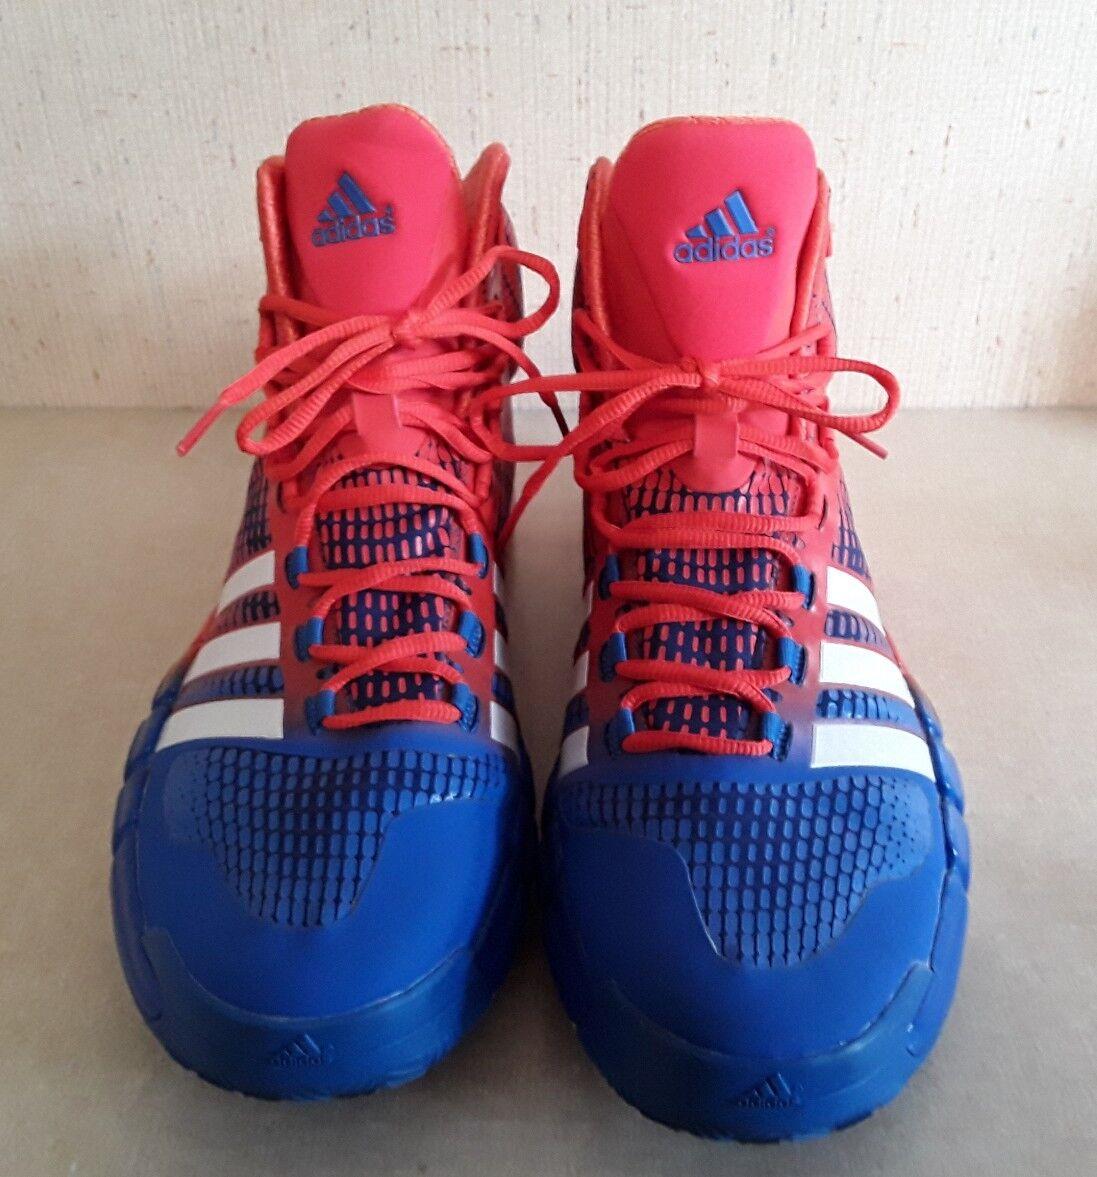 Uomo adidas crazyquick scarpe dimensioni da basket dimensioni scarpe 14,5 6c564f